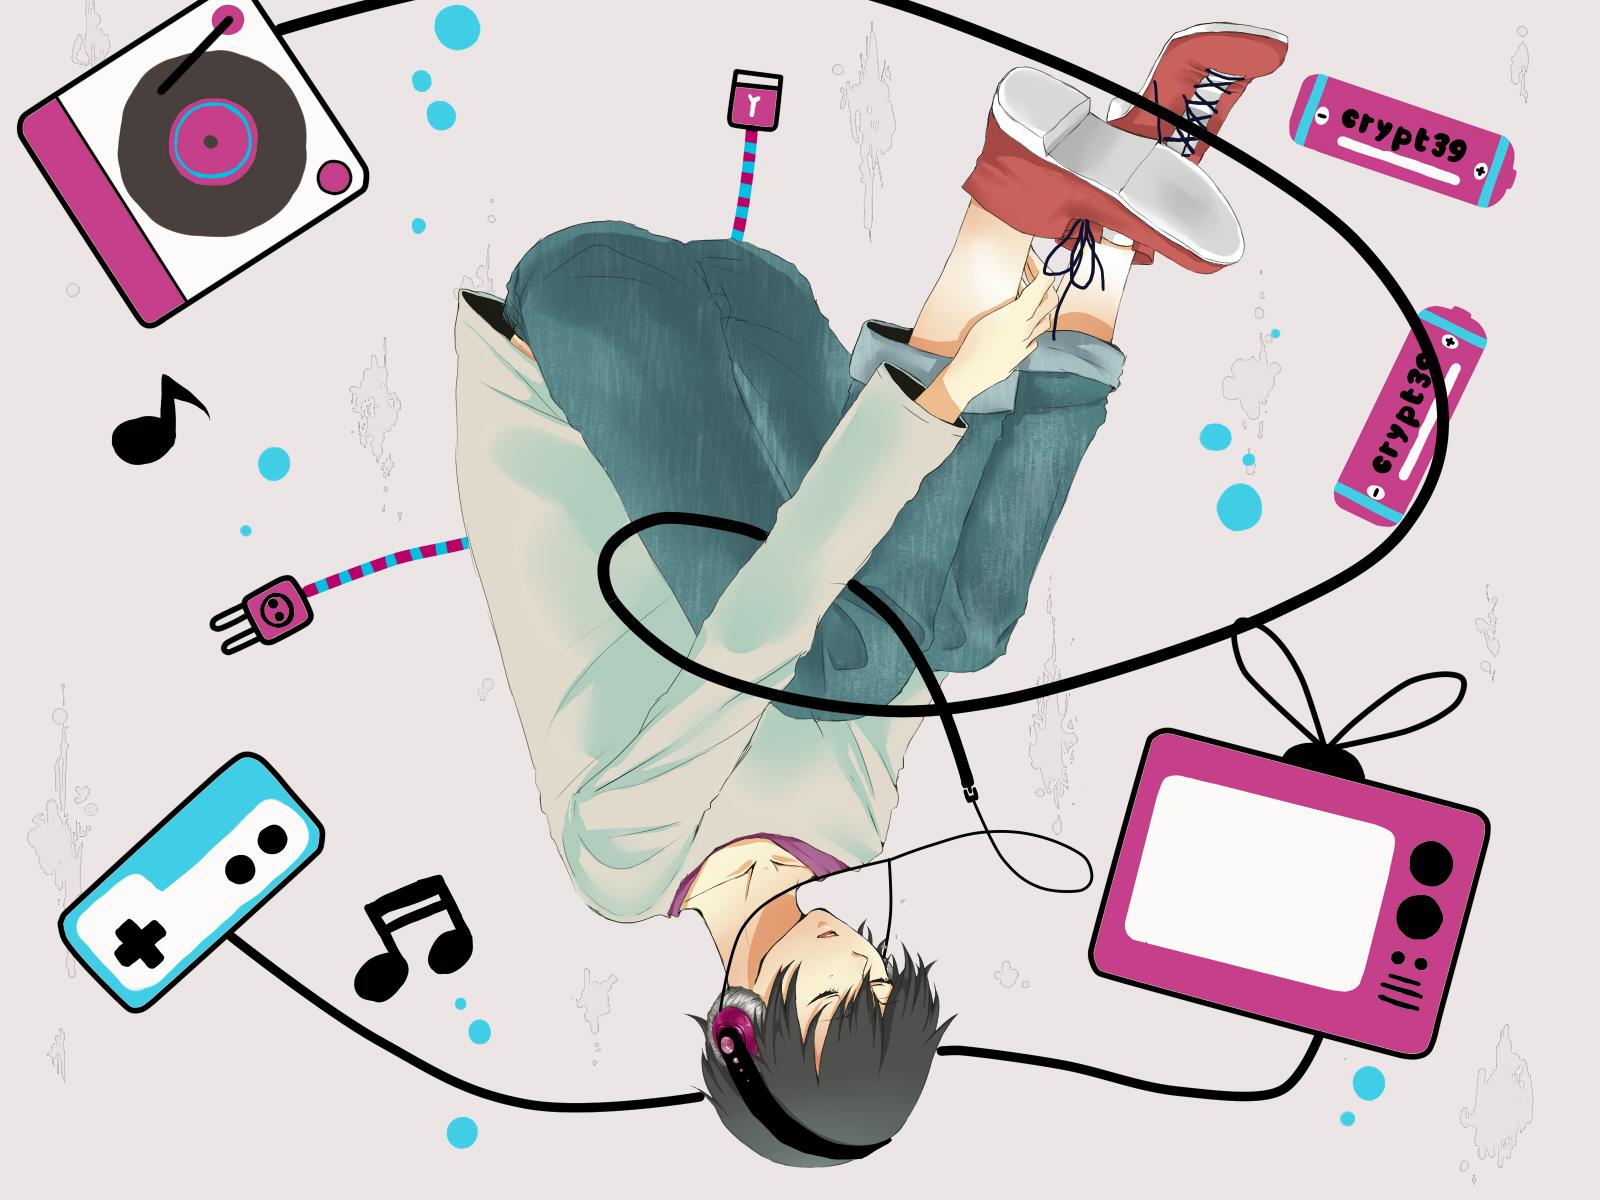 Upside Down Music Notes Fukuwa Upside Down Music